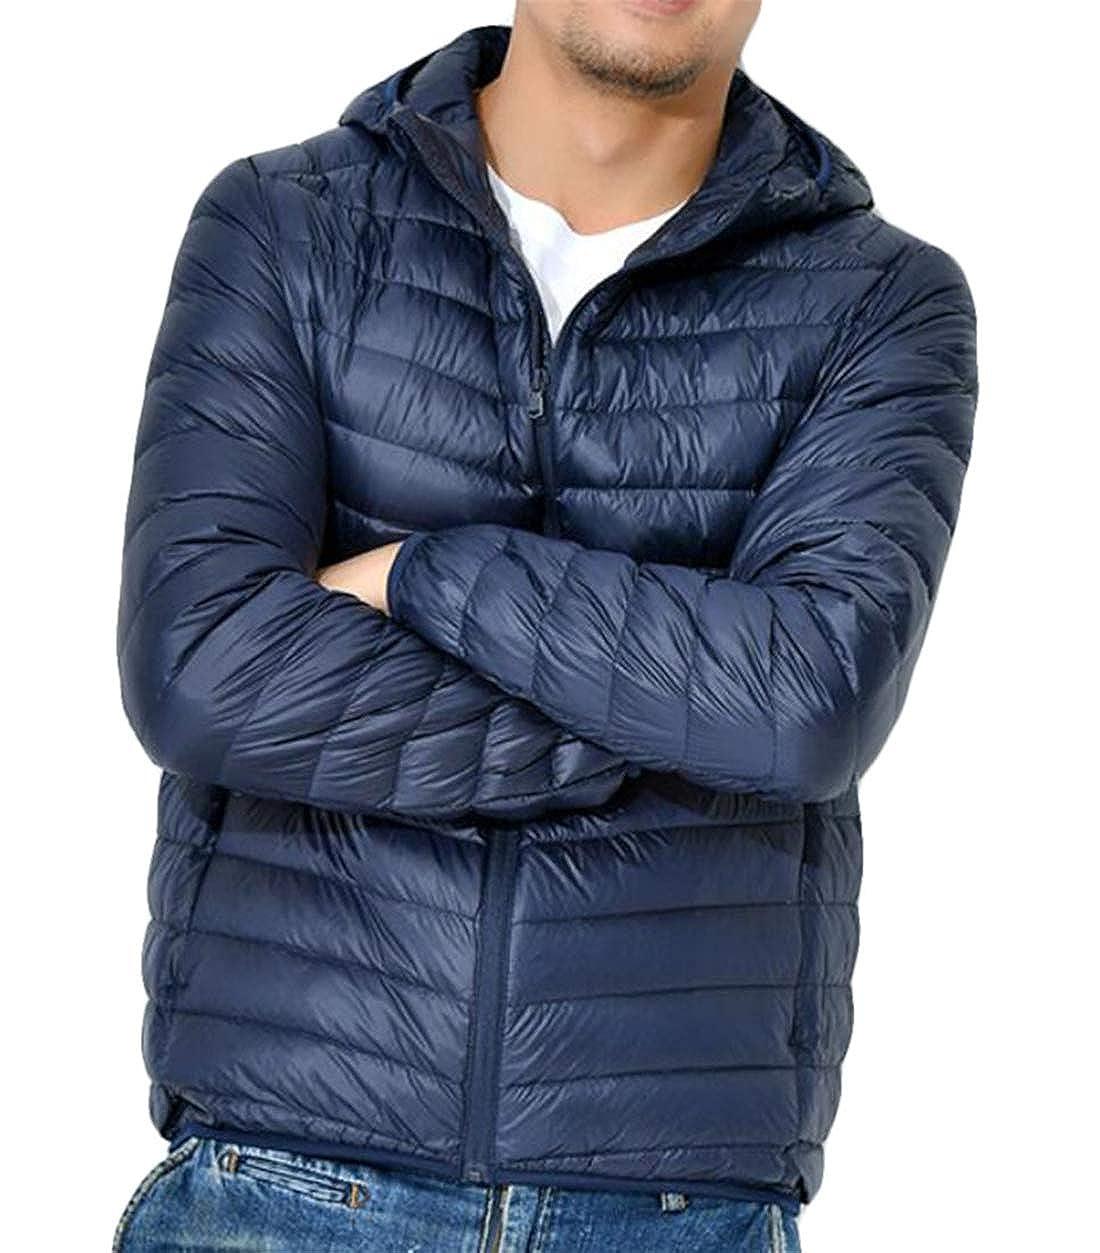 Domple Men Short Lightweight Warm Hooded Packable Down Jacket Coat Outerwear